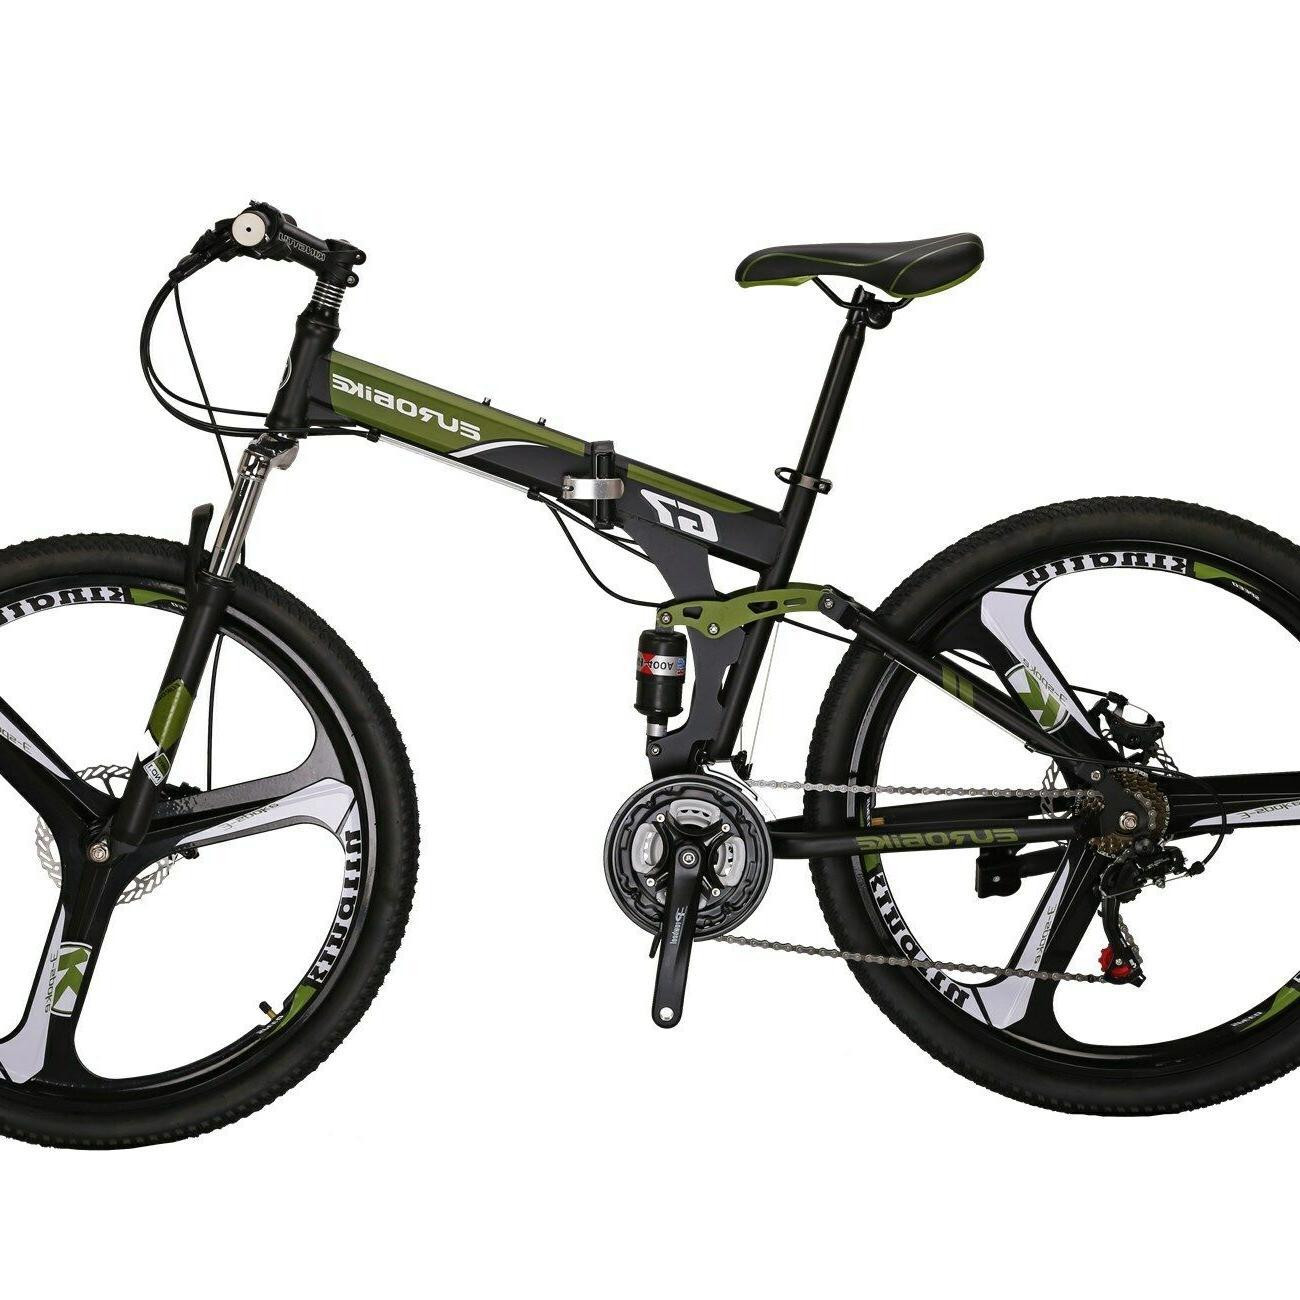 "G7 Folding 21 Disc 27.5"" Bicycle"